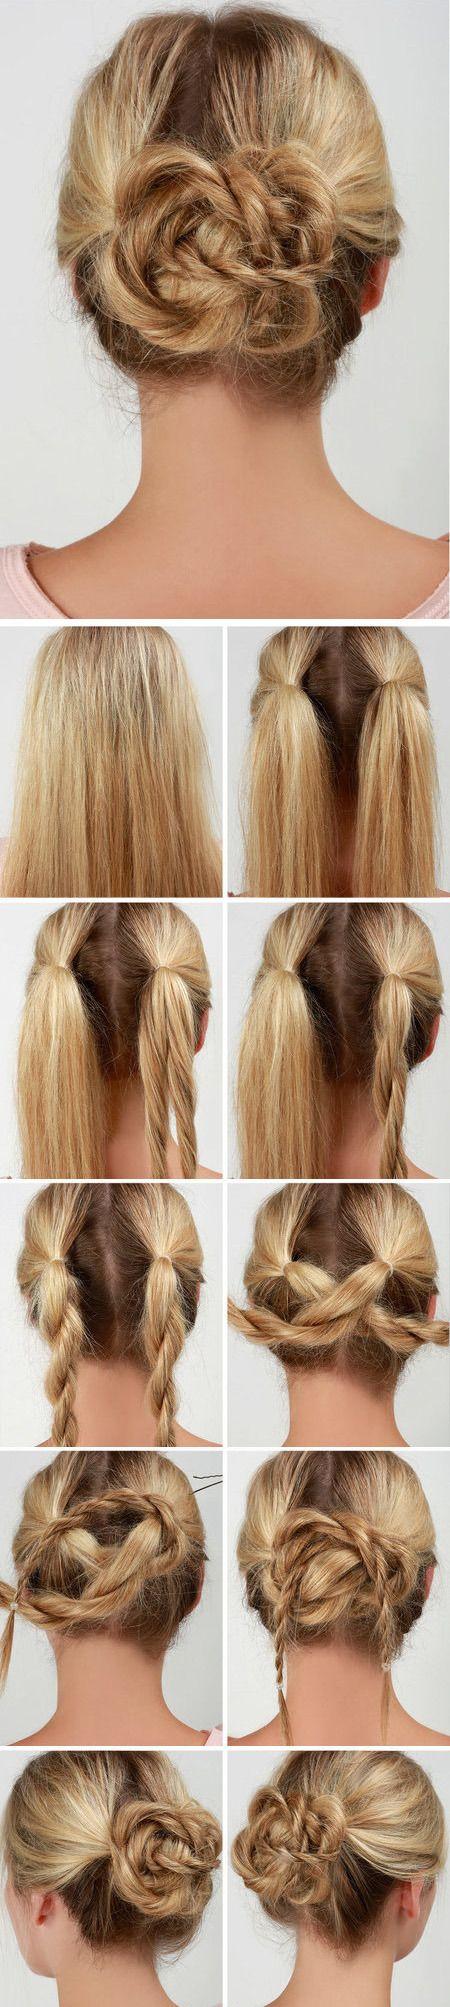 Feminine Look With Floral Hair Decoration